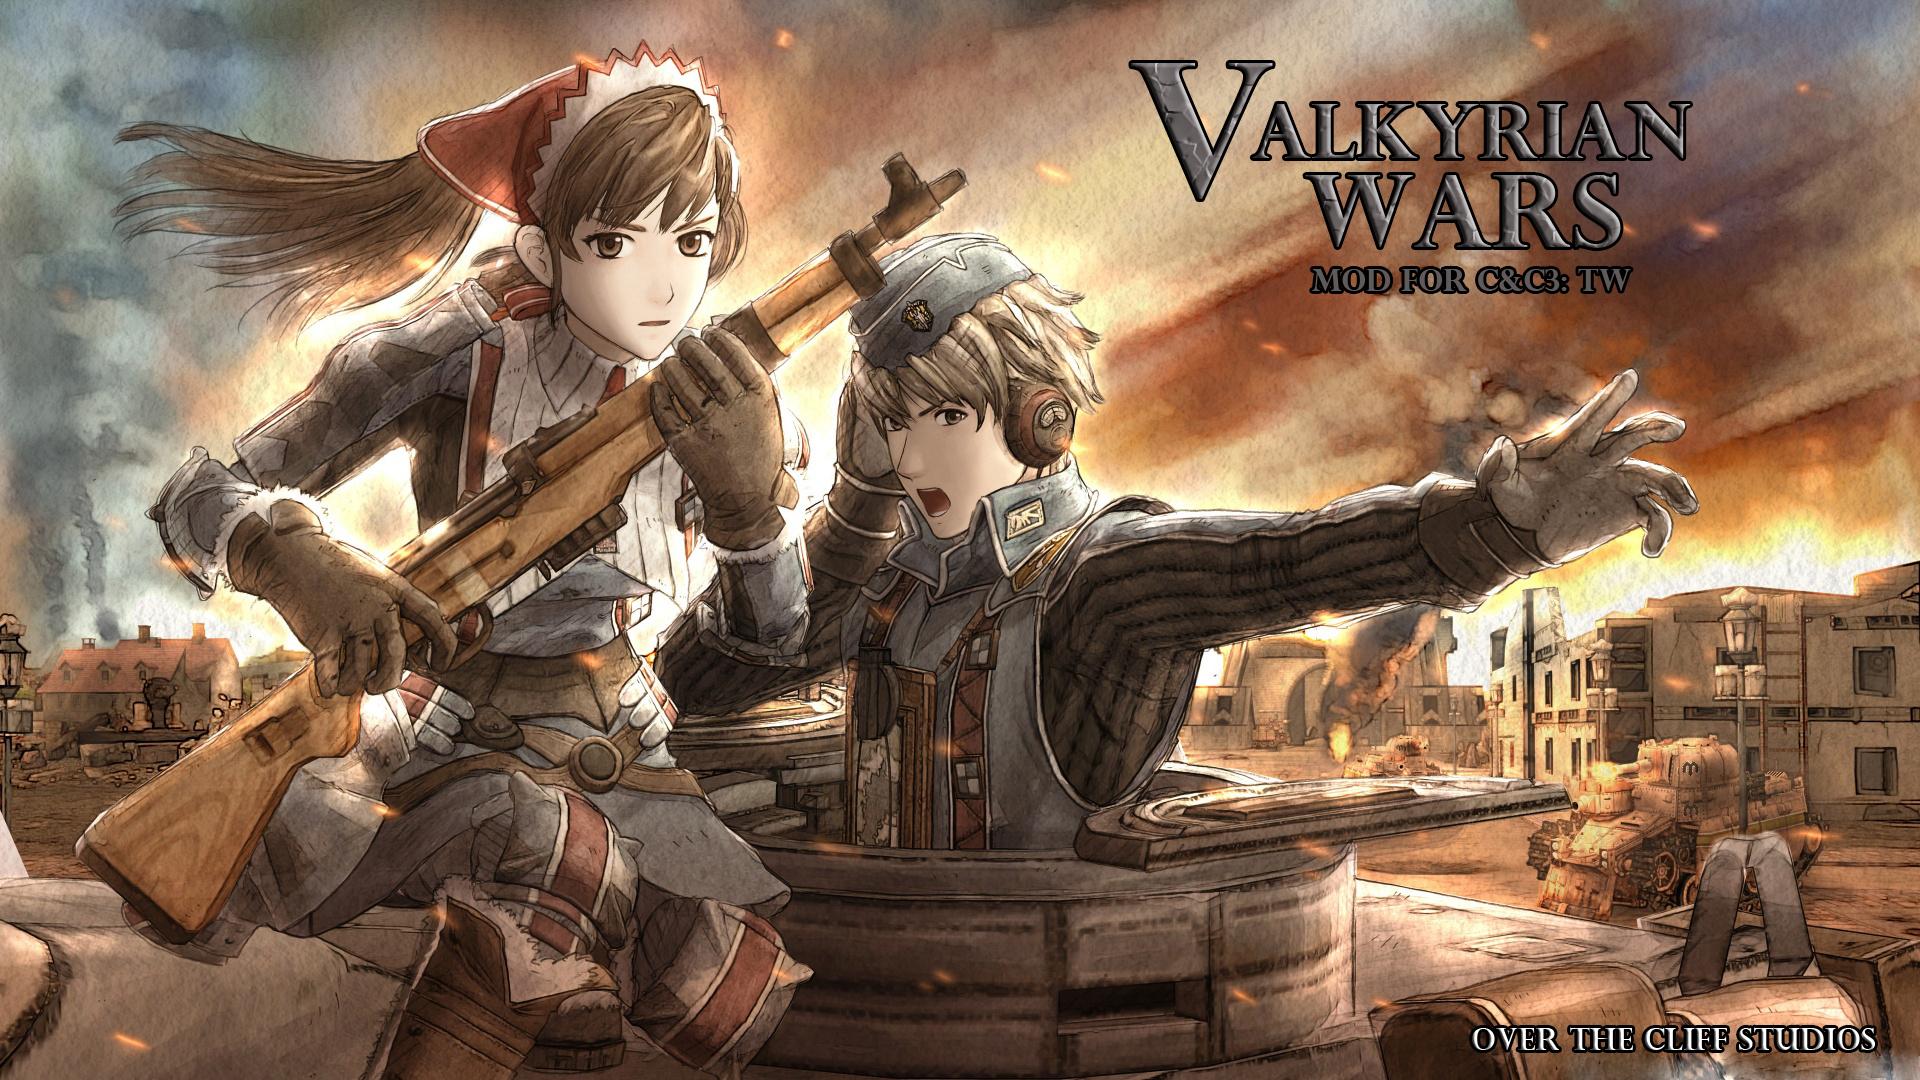 Wallpaper Engine Gun Anime Girl Valkyrian Wars Mod Mod Db